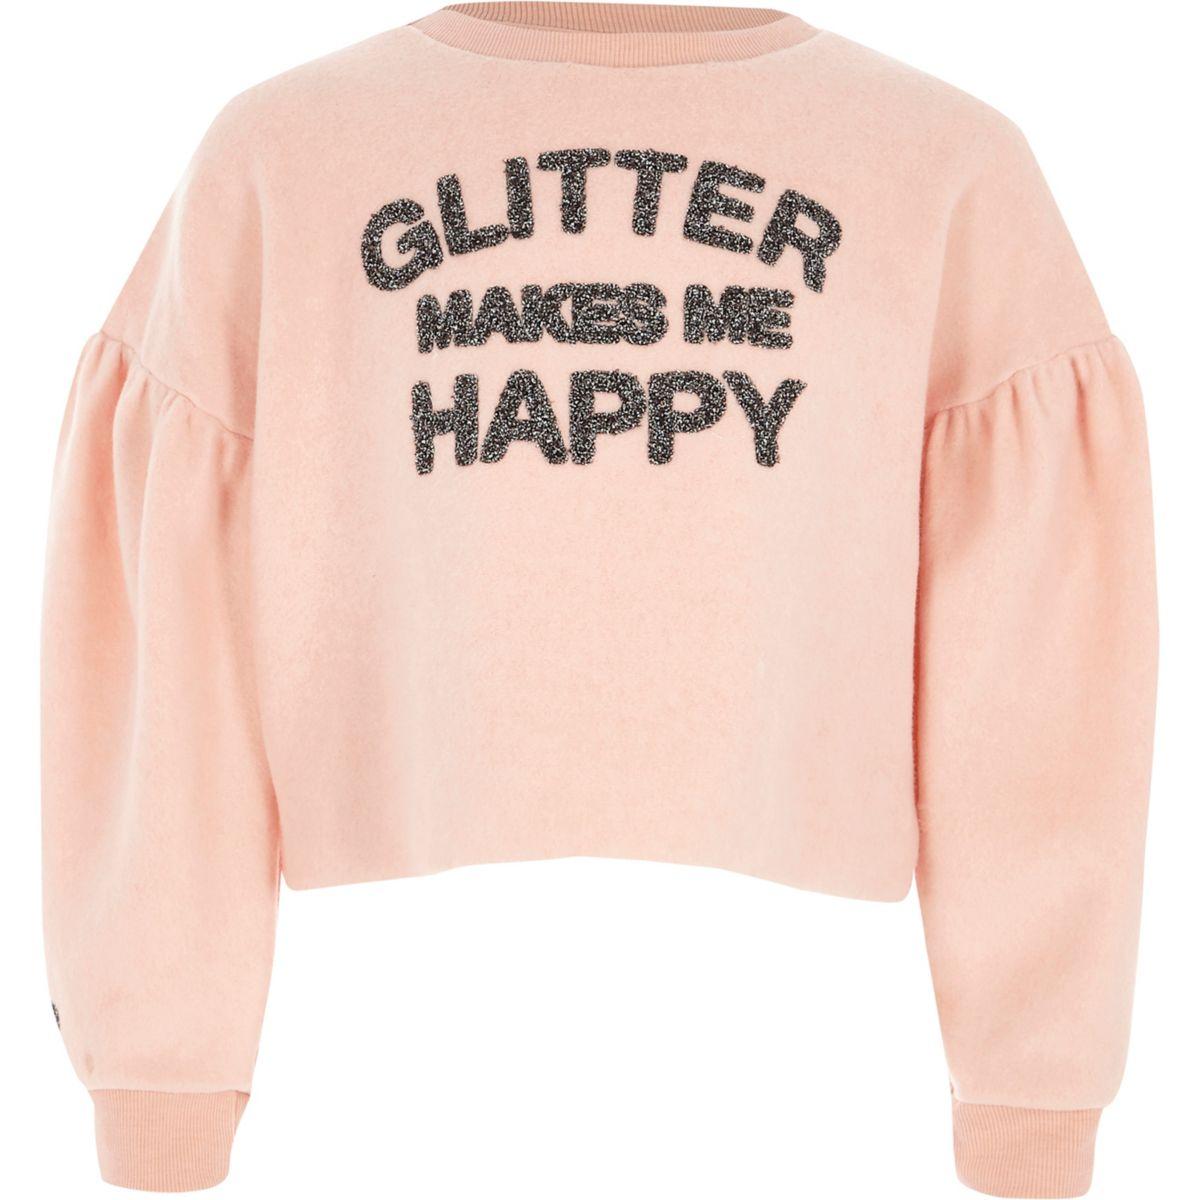 Girls 'glitter makes me happy' sweatshirt